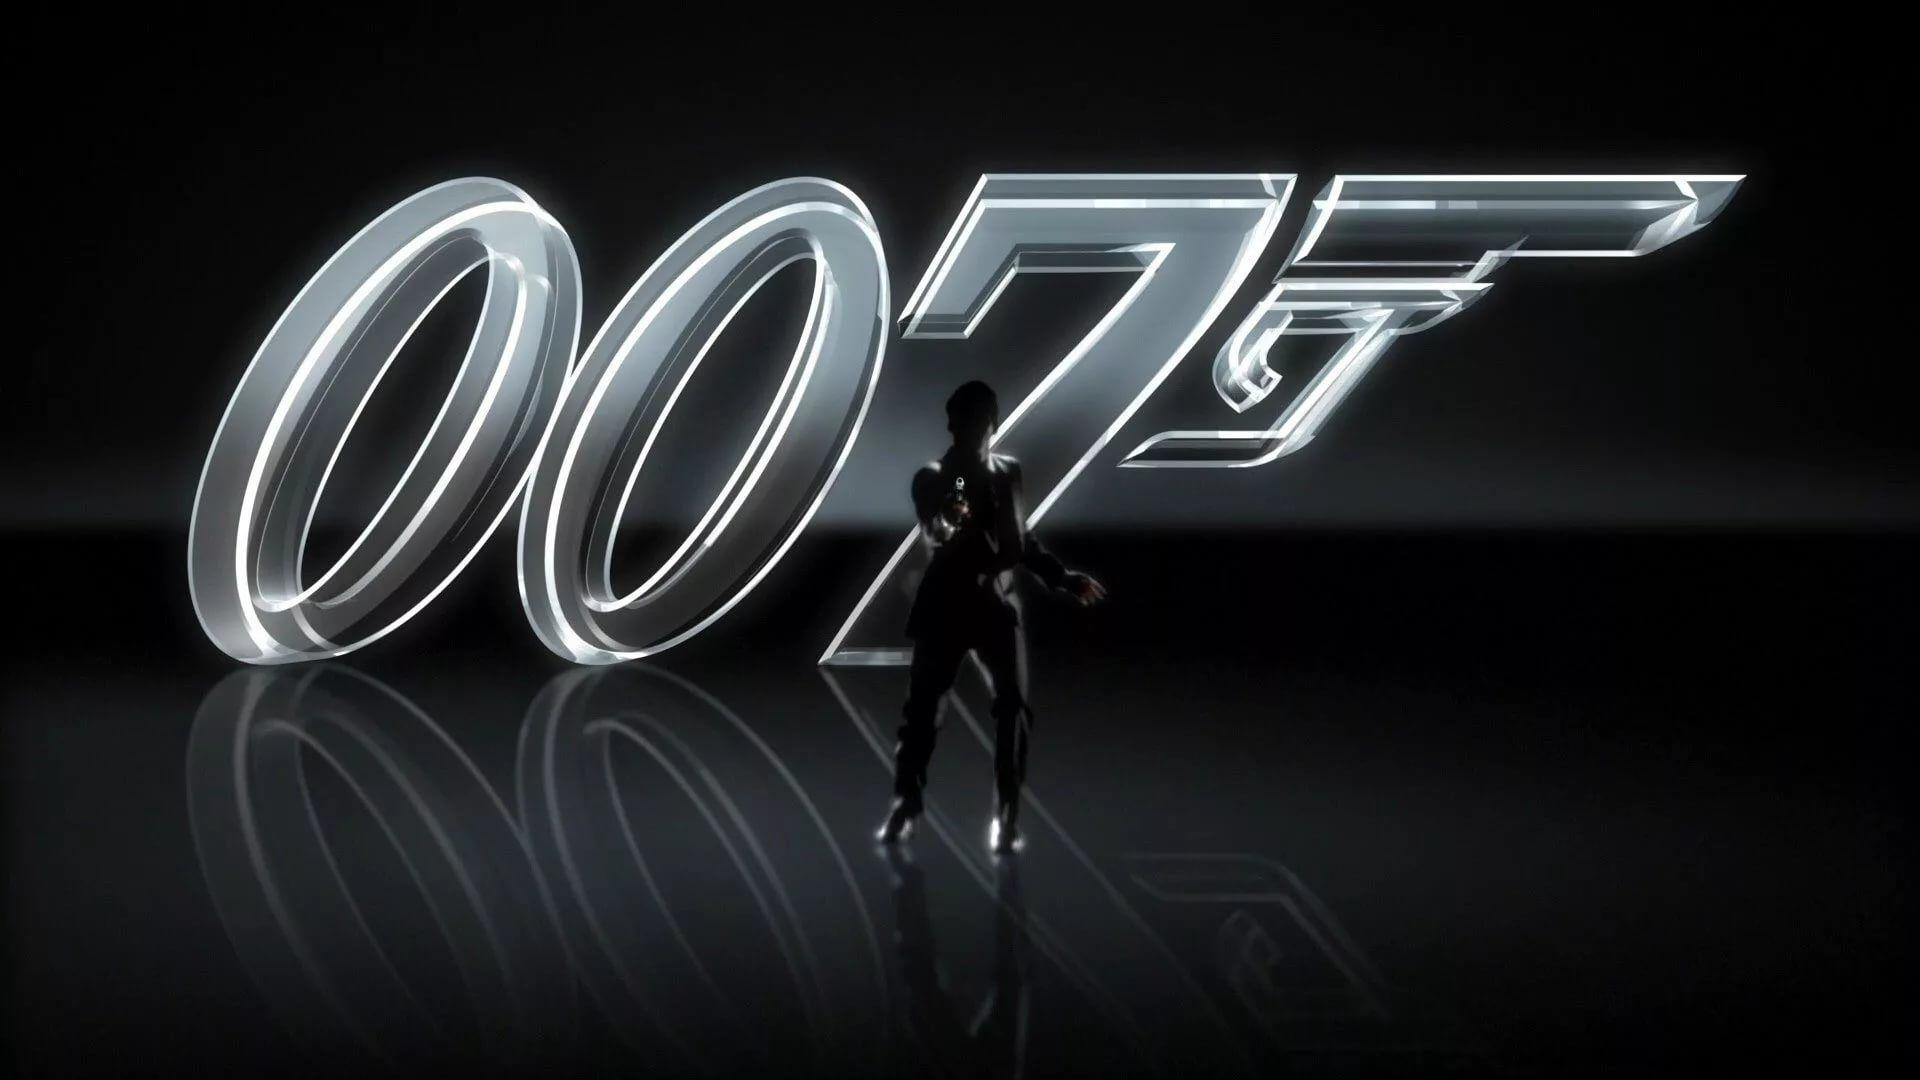 James Bond Background Wallpaper